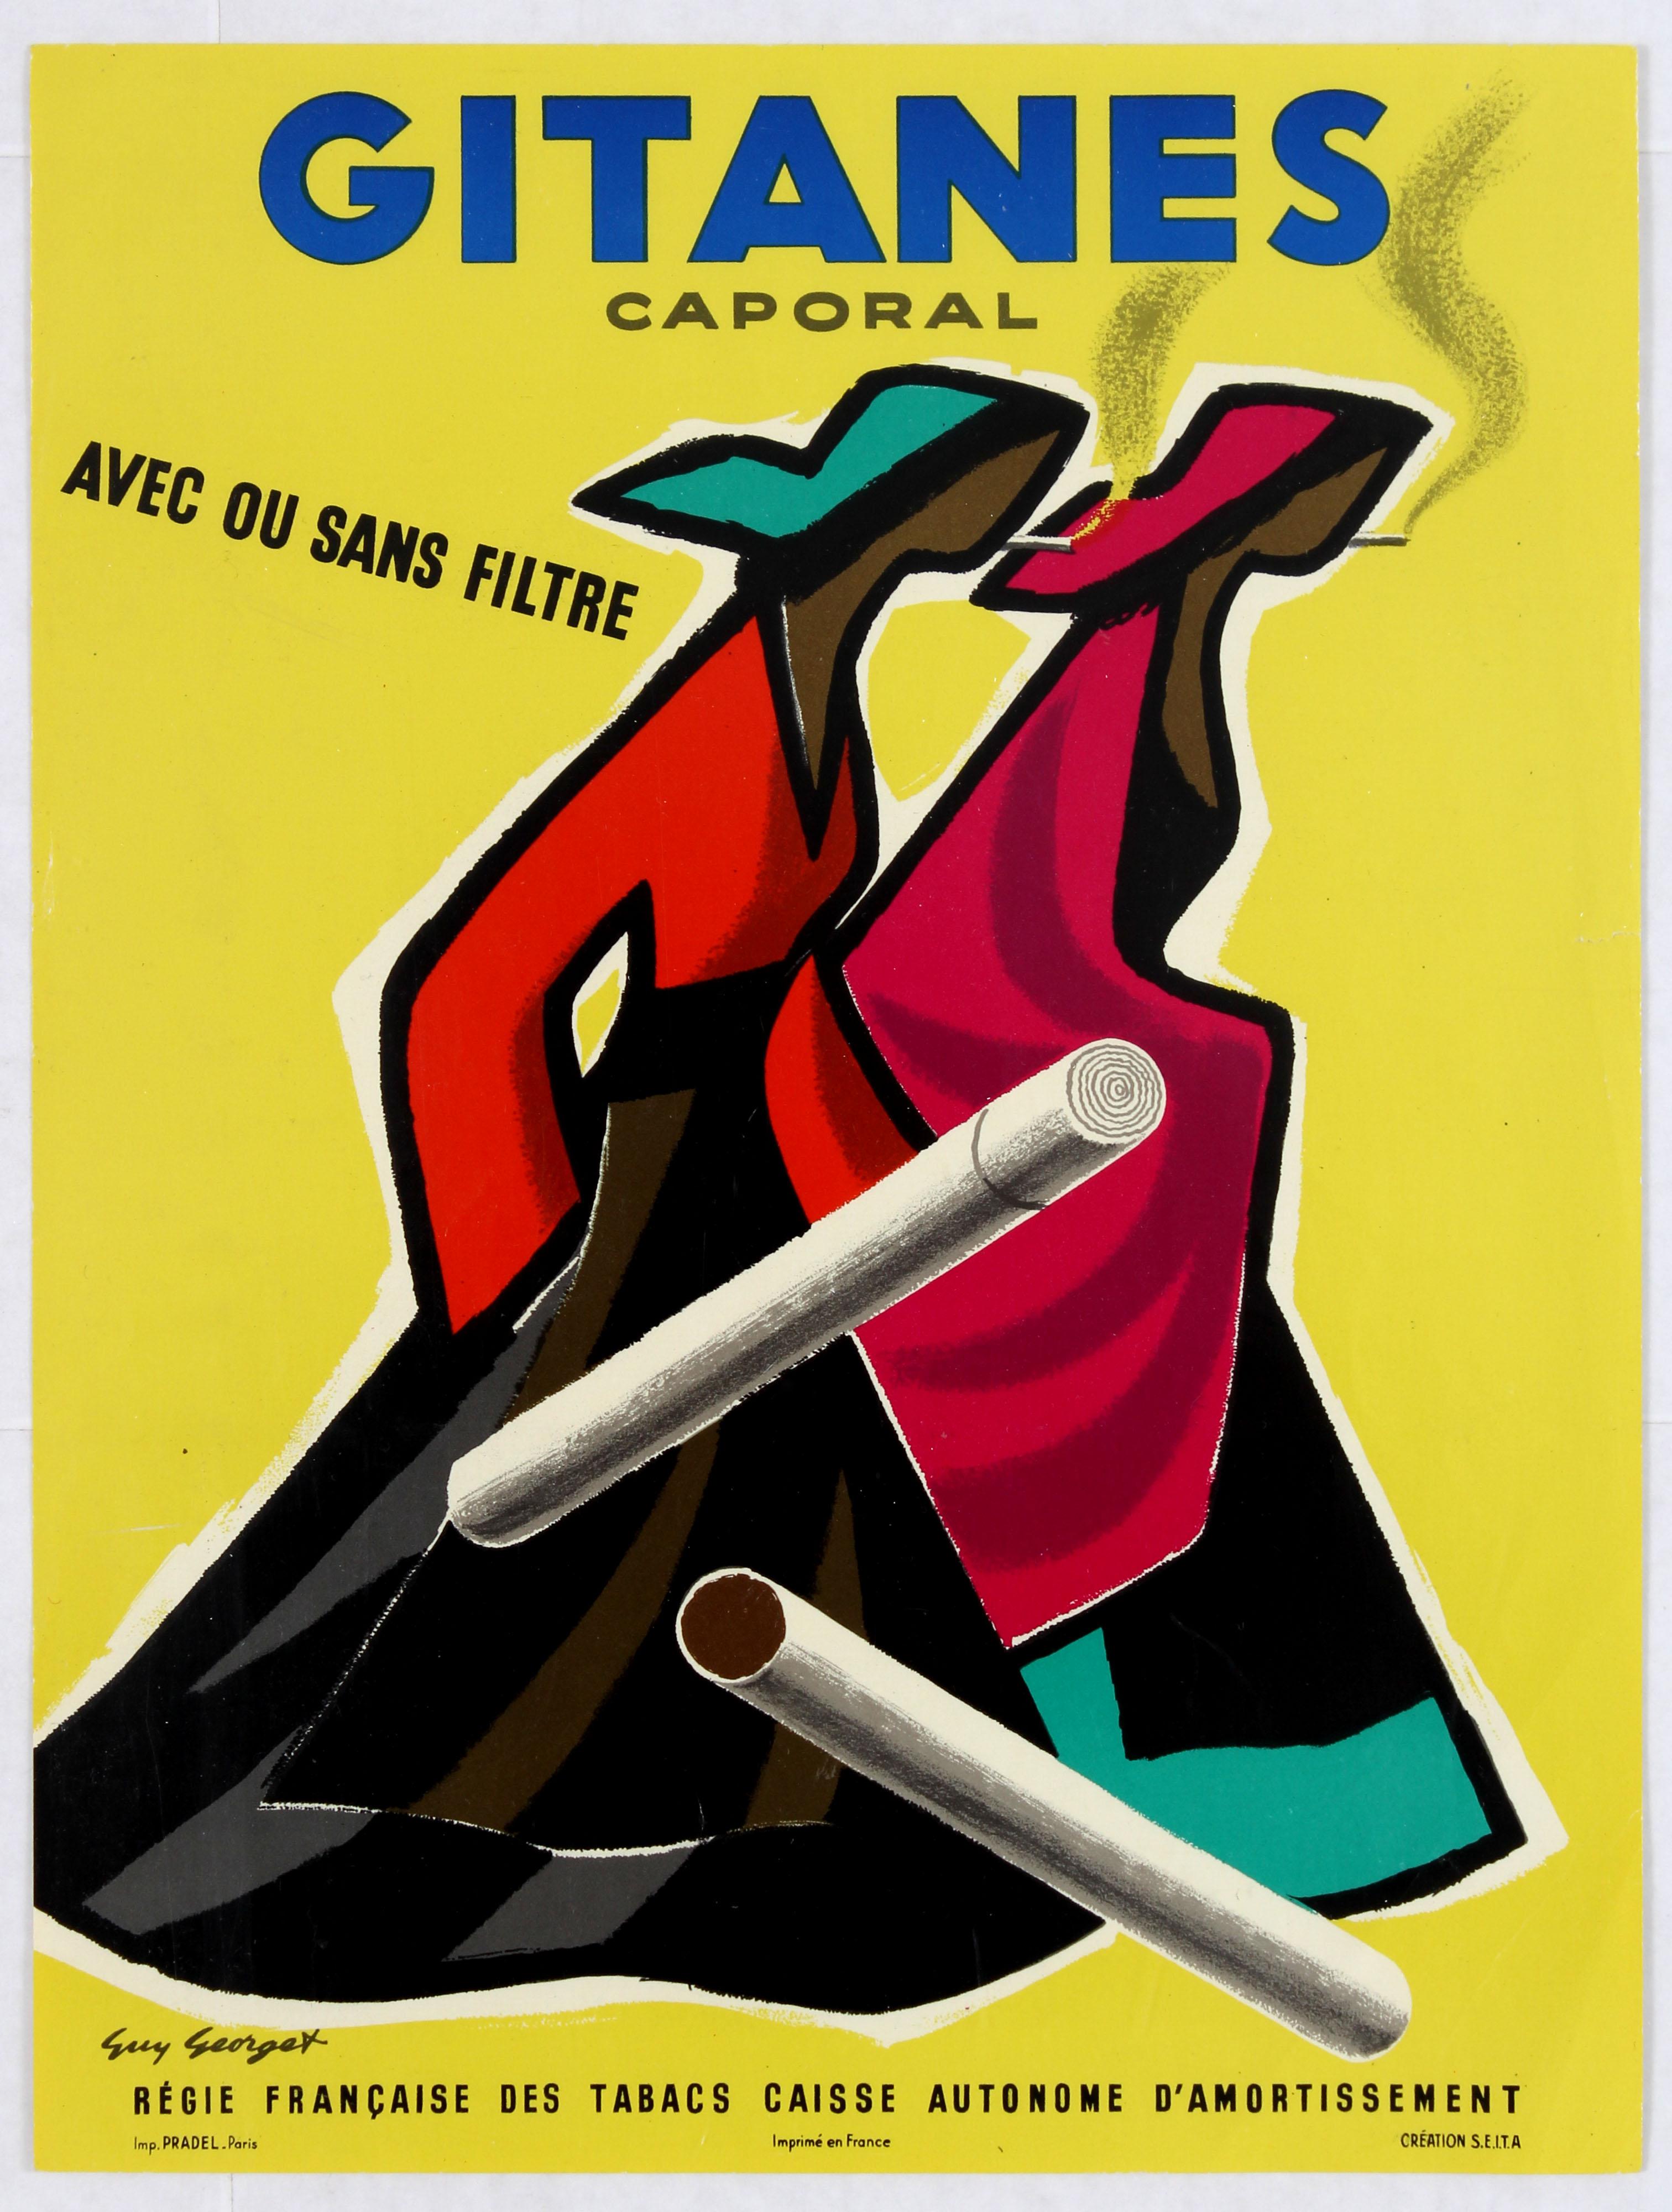 Lot 1508 - Advertising Poster Gitanes Caporal Cigarettes Georget